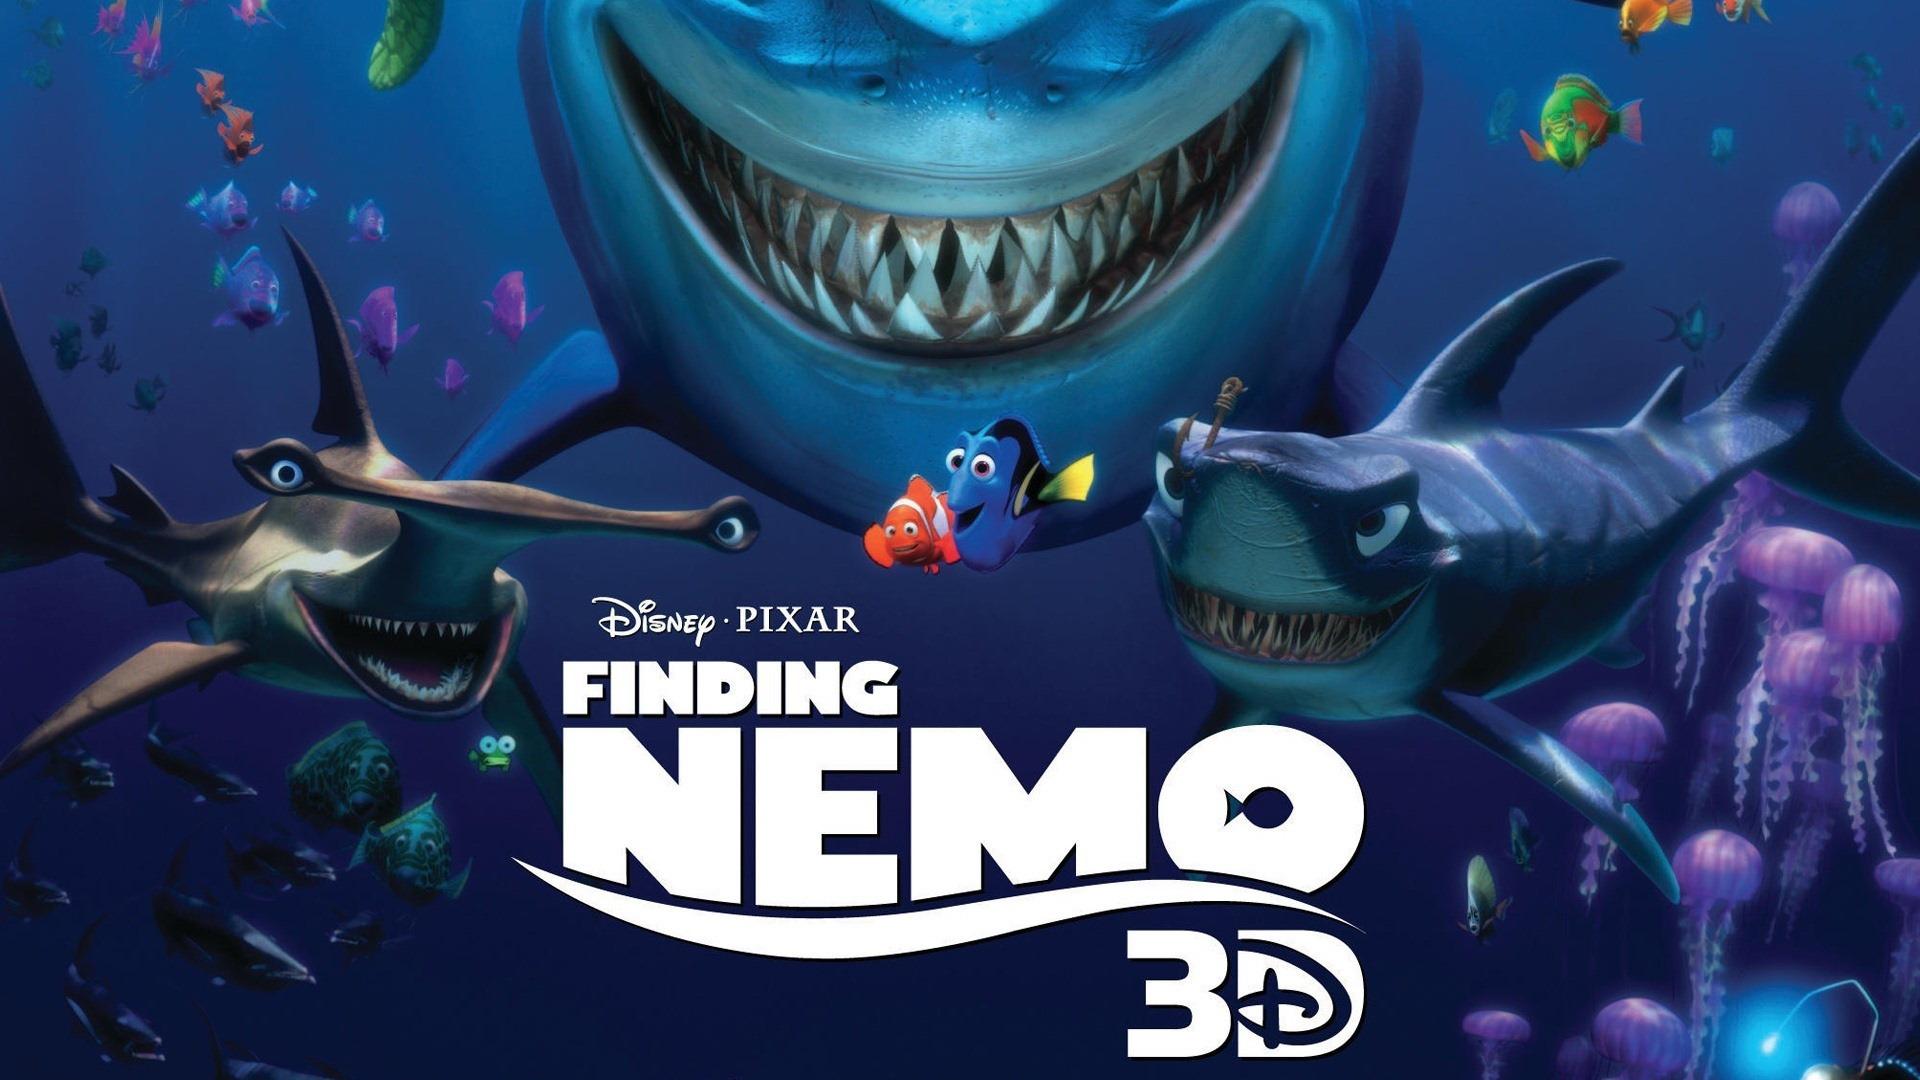 Finding Nemo 3d Movie Hd Desktop Wallpaper 1920x1080 Wallpaper